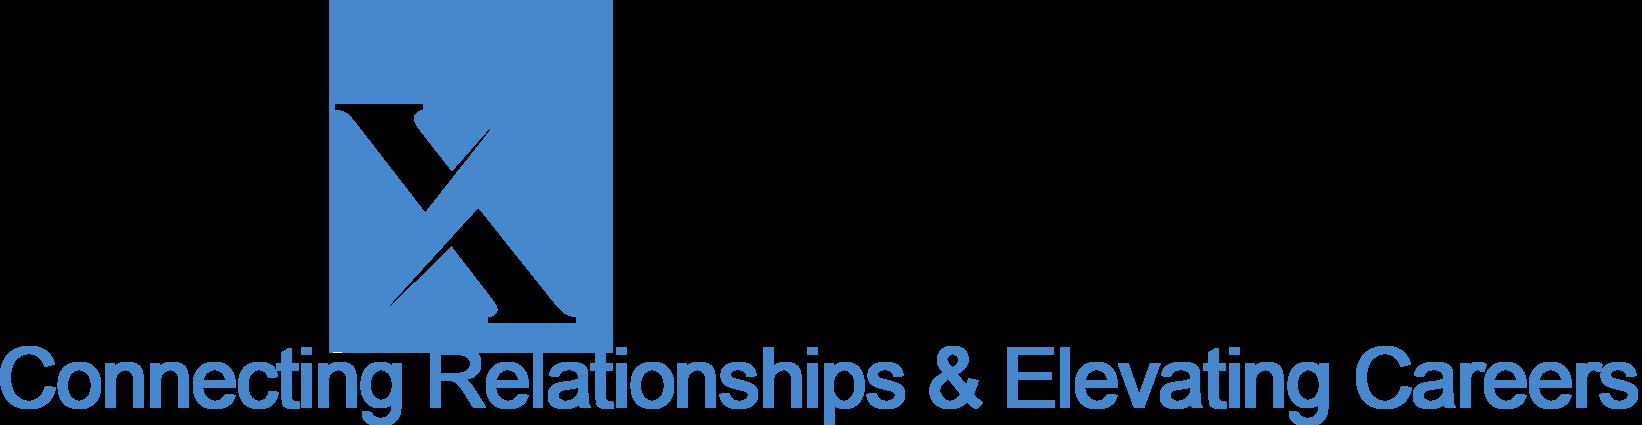 10x Recruiting Partners